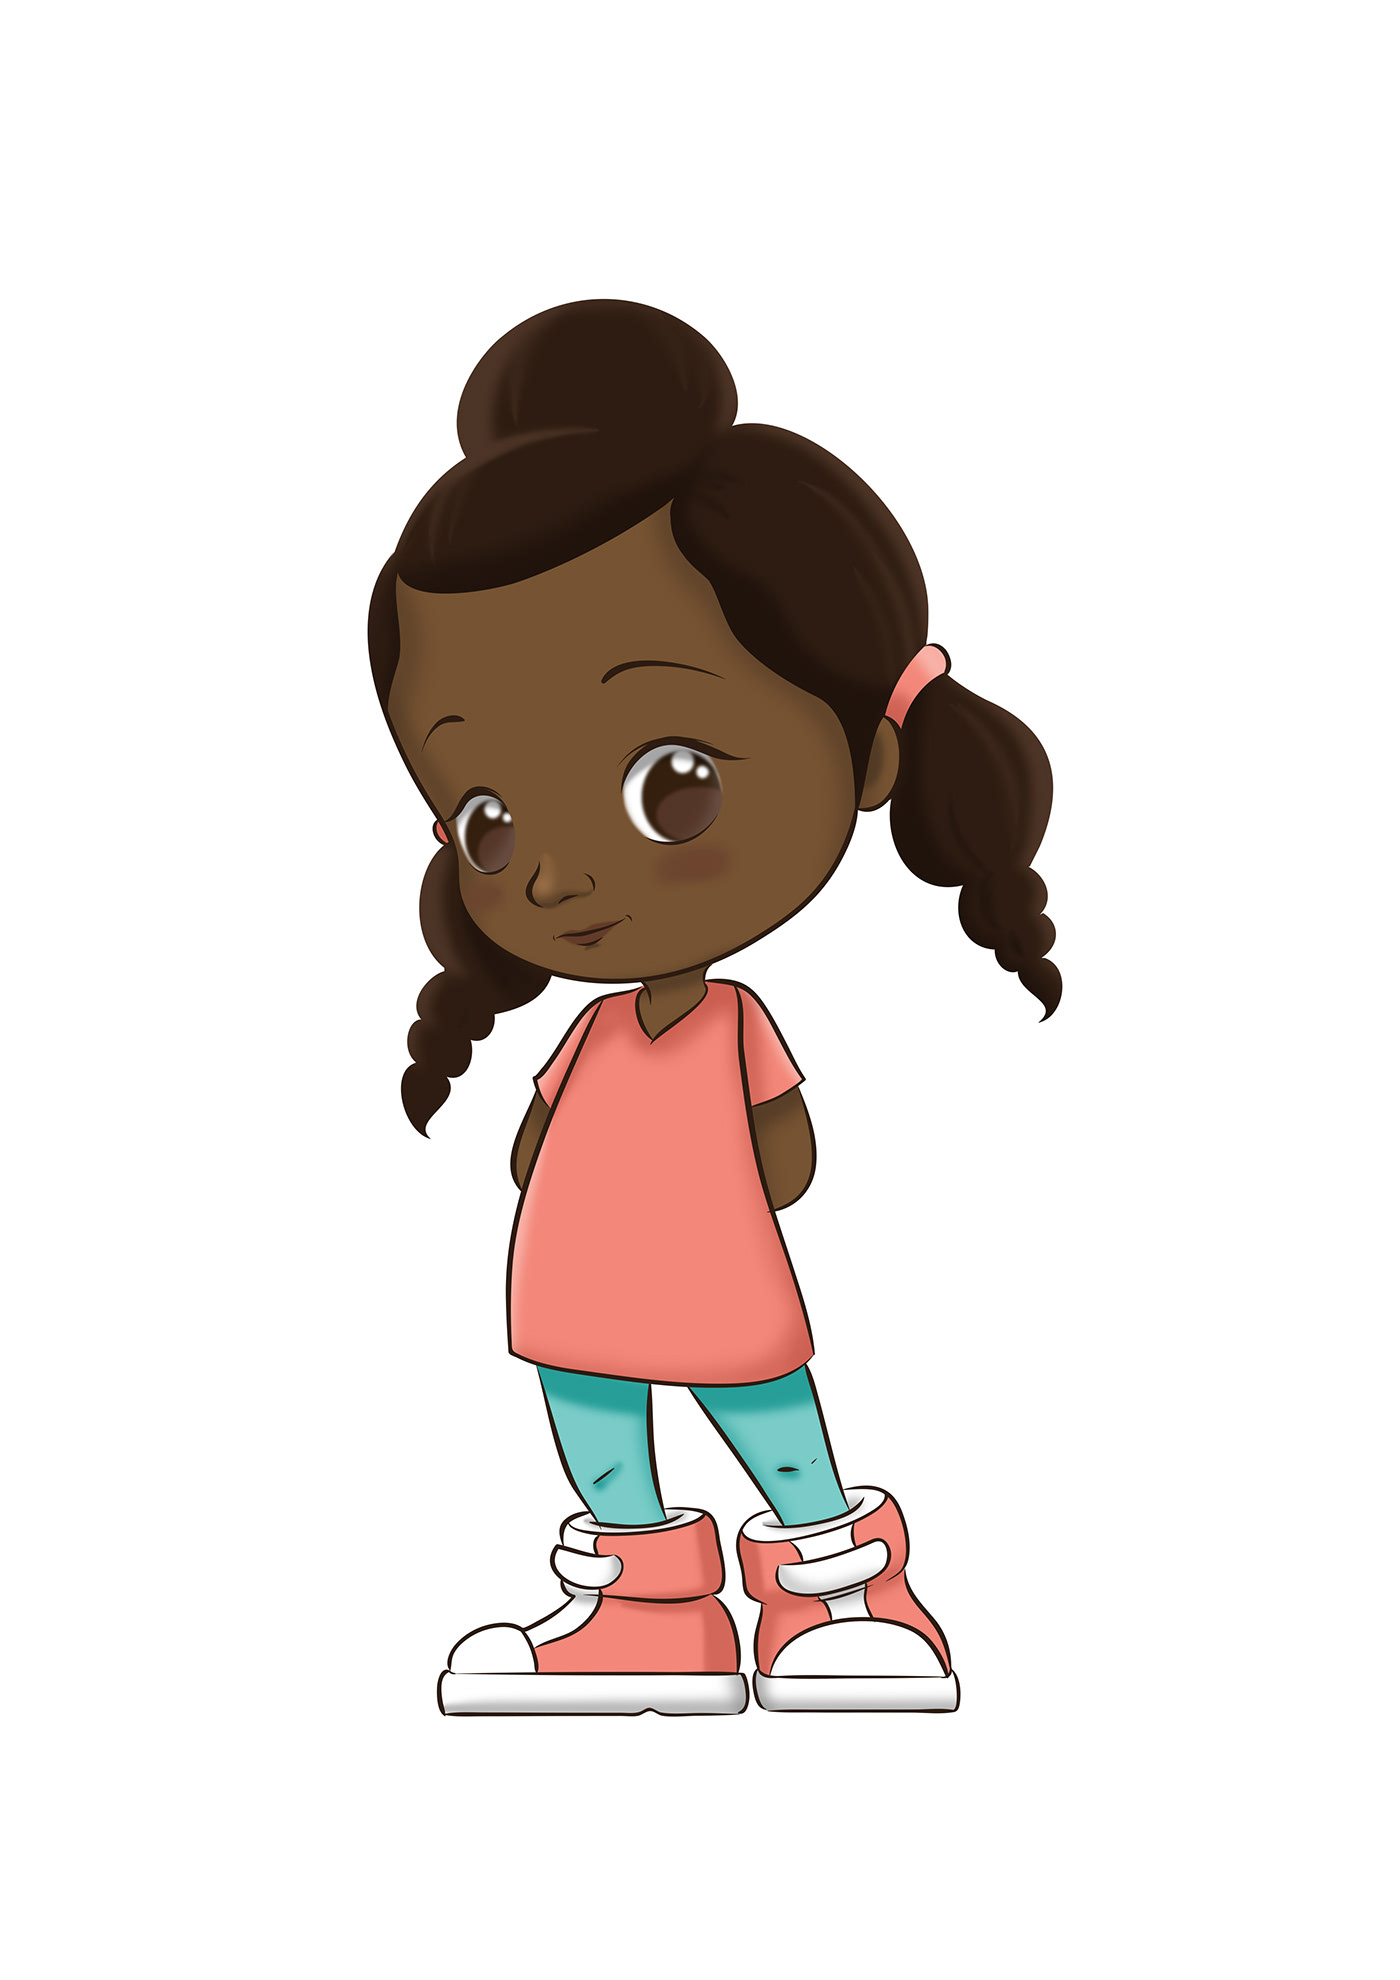 art black character cartoon Character children book coloring book illustrated illustrations Illustrator Paintings portraits Wayne Flint